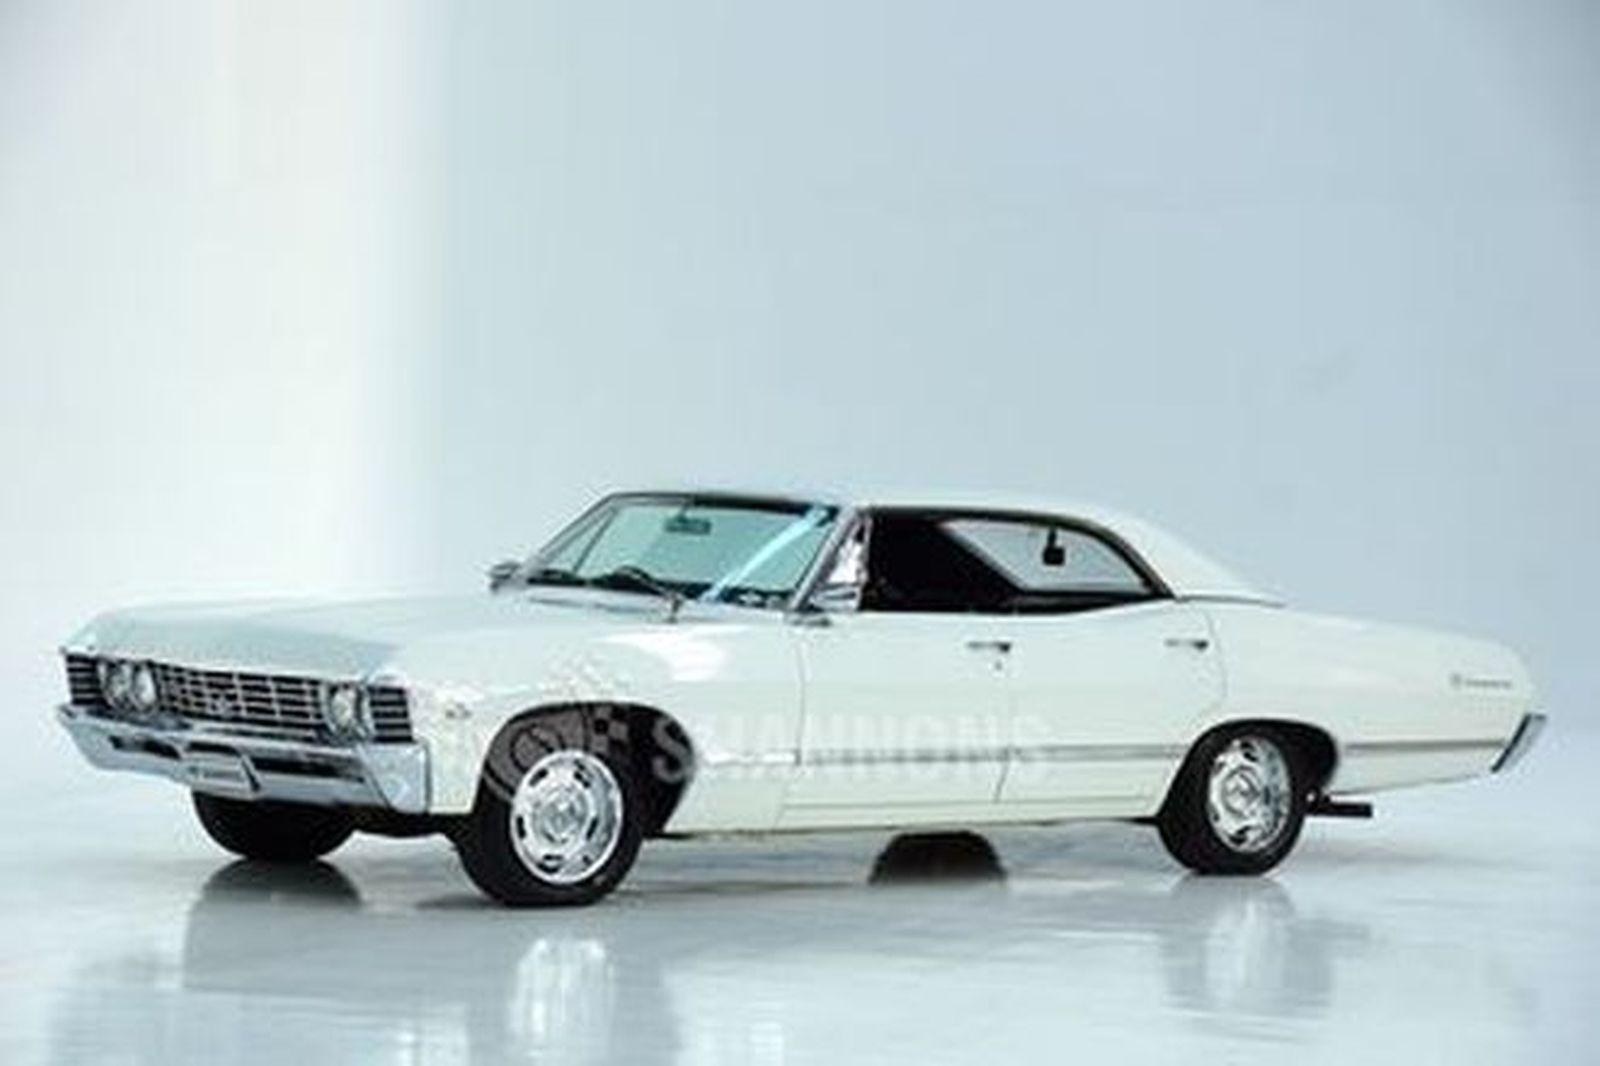 Sold Chevrolet Impala Pillarless Sedan Rhd Auctions Lot 37 Shannons